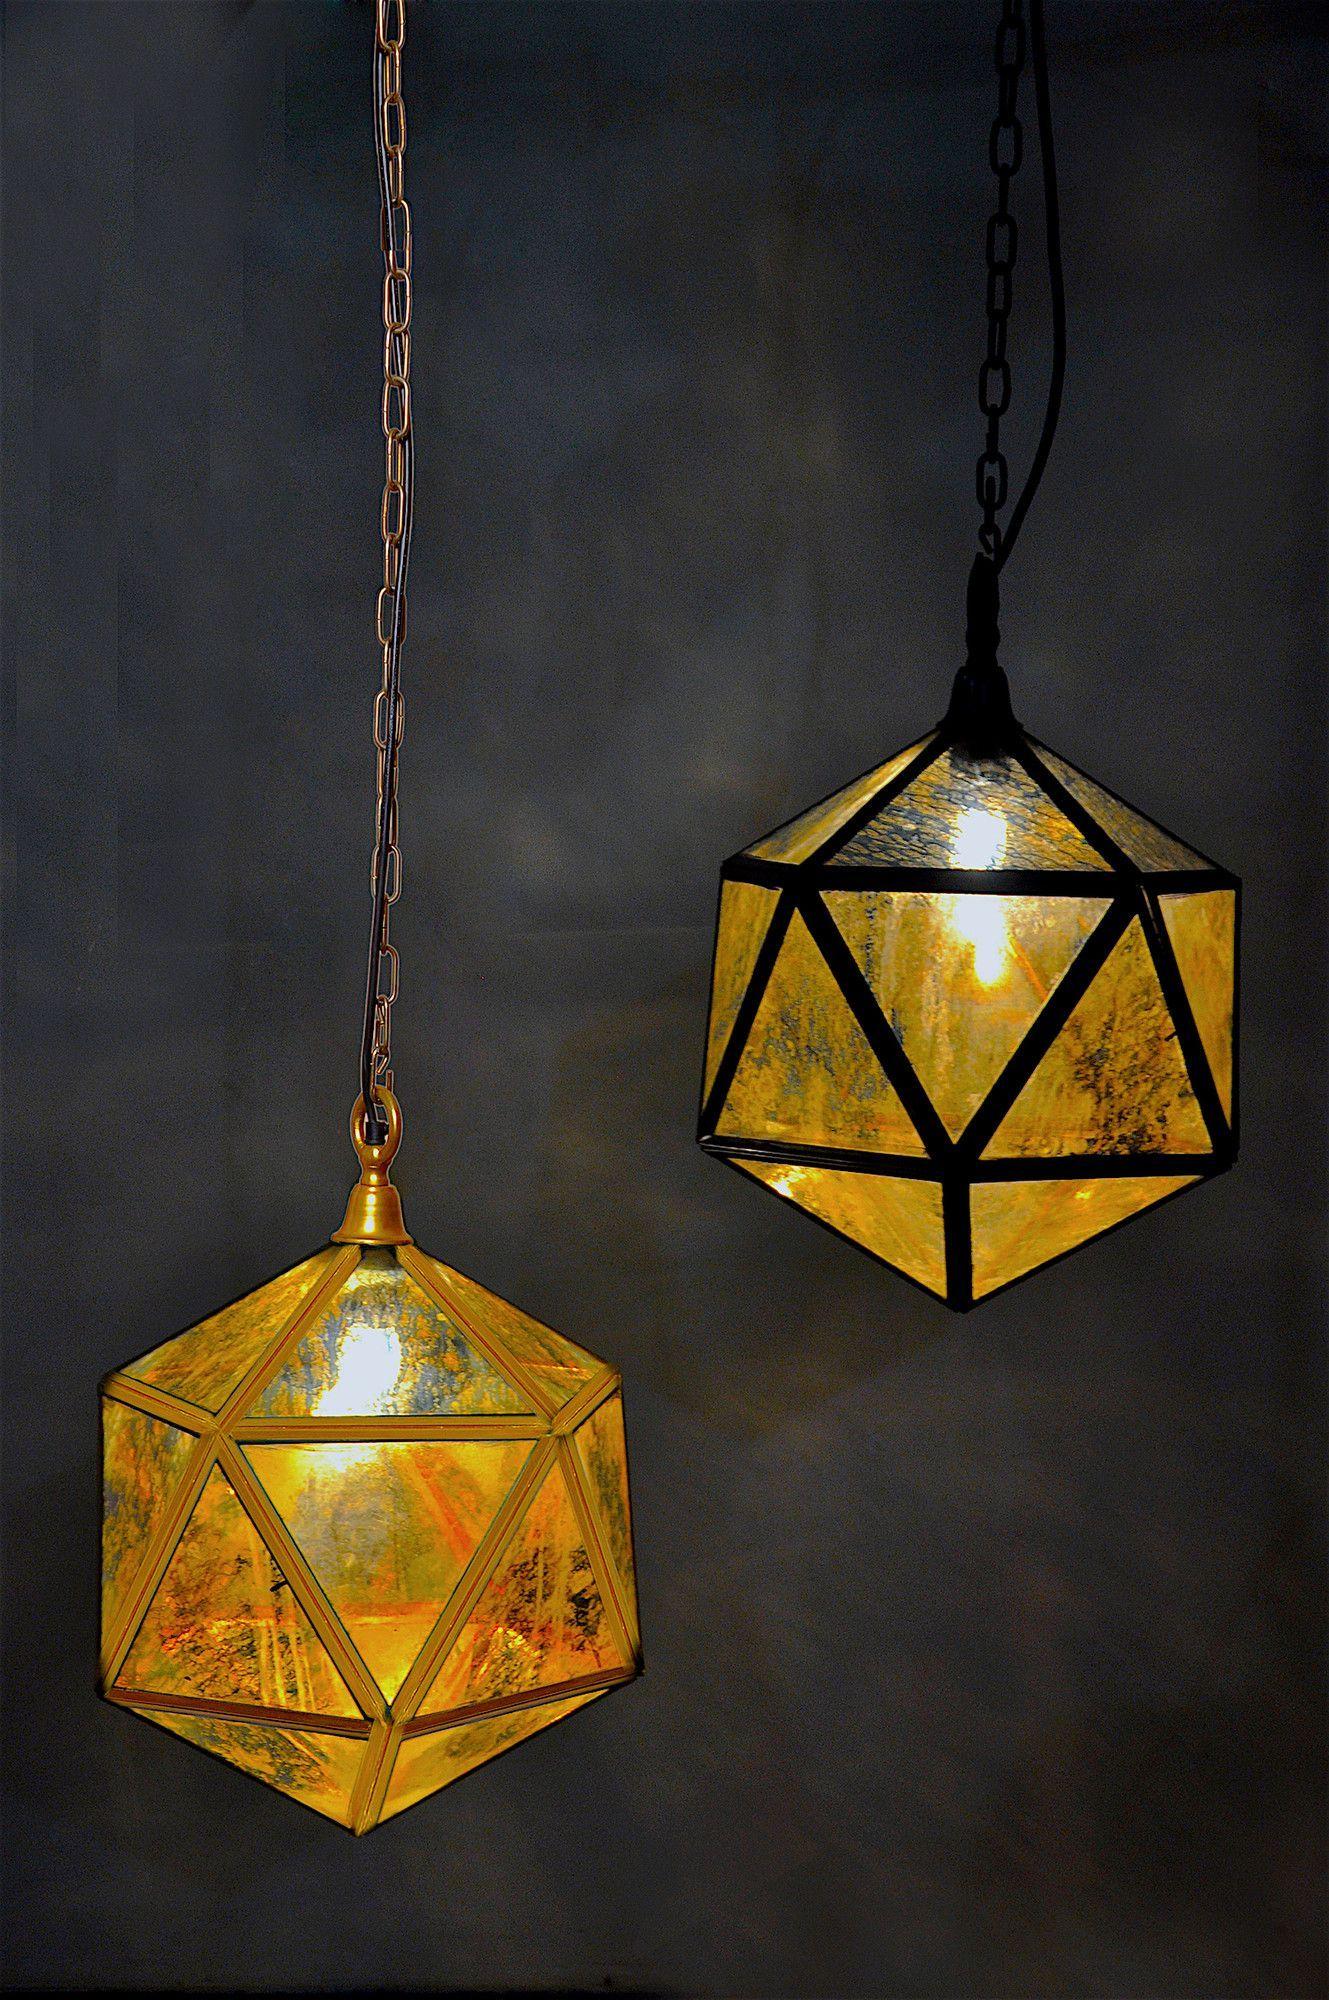 Prisim Mercury Glass 1-Light Geometric Pendant   Products inside 1-Light Geometric Globe Pendants (Image 26 of 30)